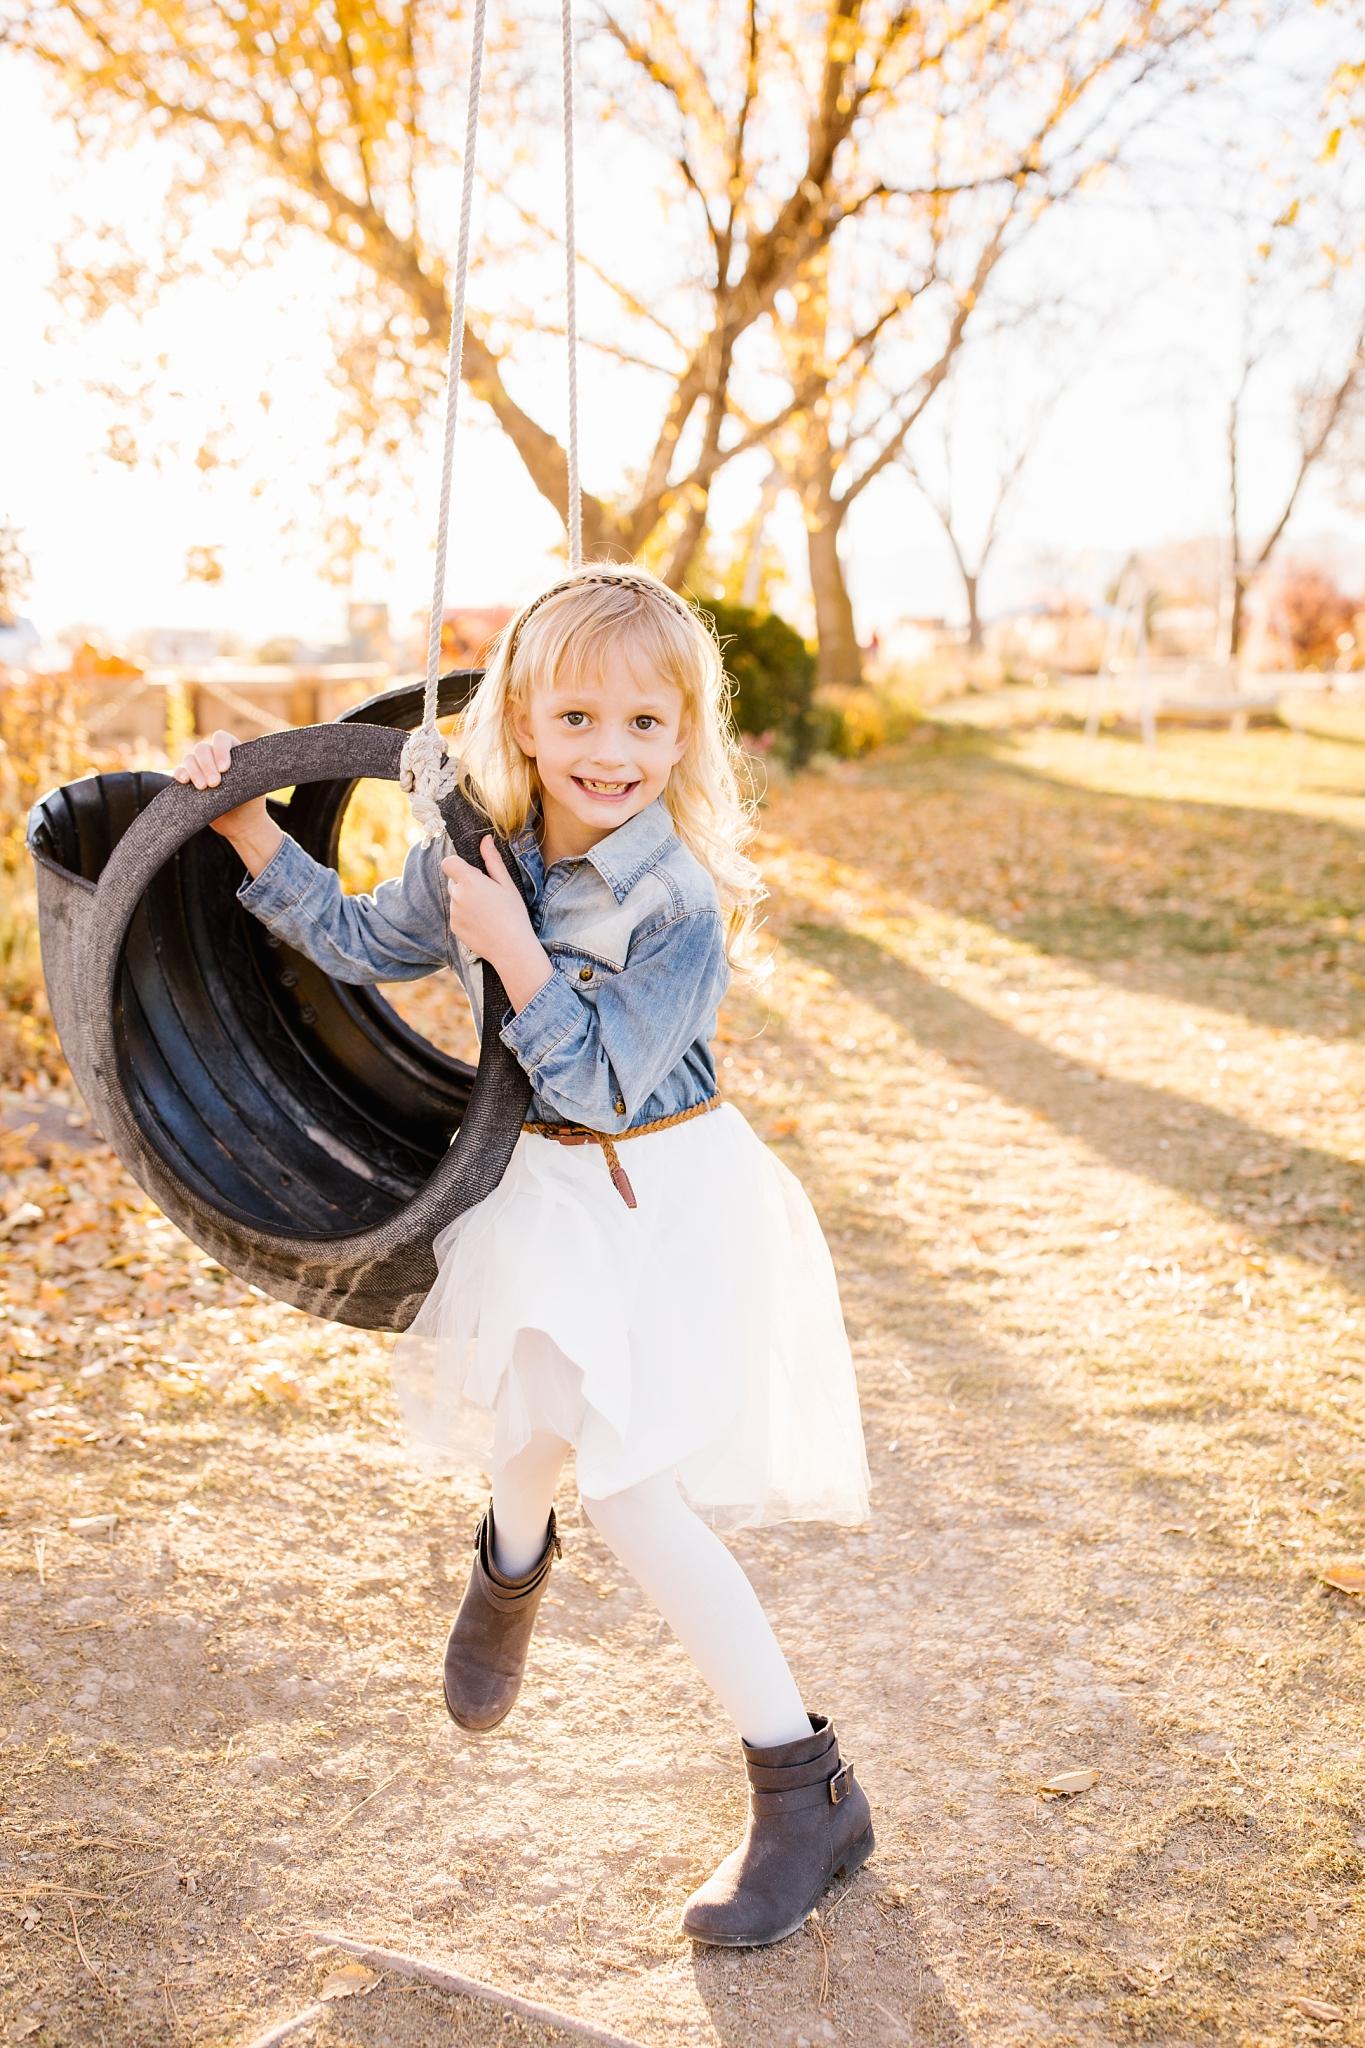 Mickelsen-22_Lizzie-B-Imagery-Utah-Family-Photographer-Lifestyle-Photography-Salt-Lake-City-Park-City-Utah-County.jpg